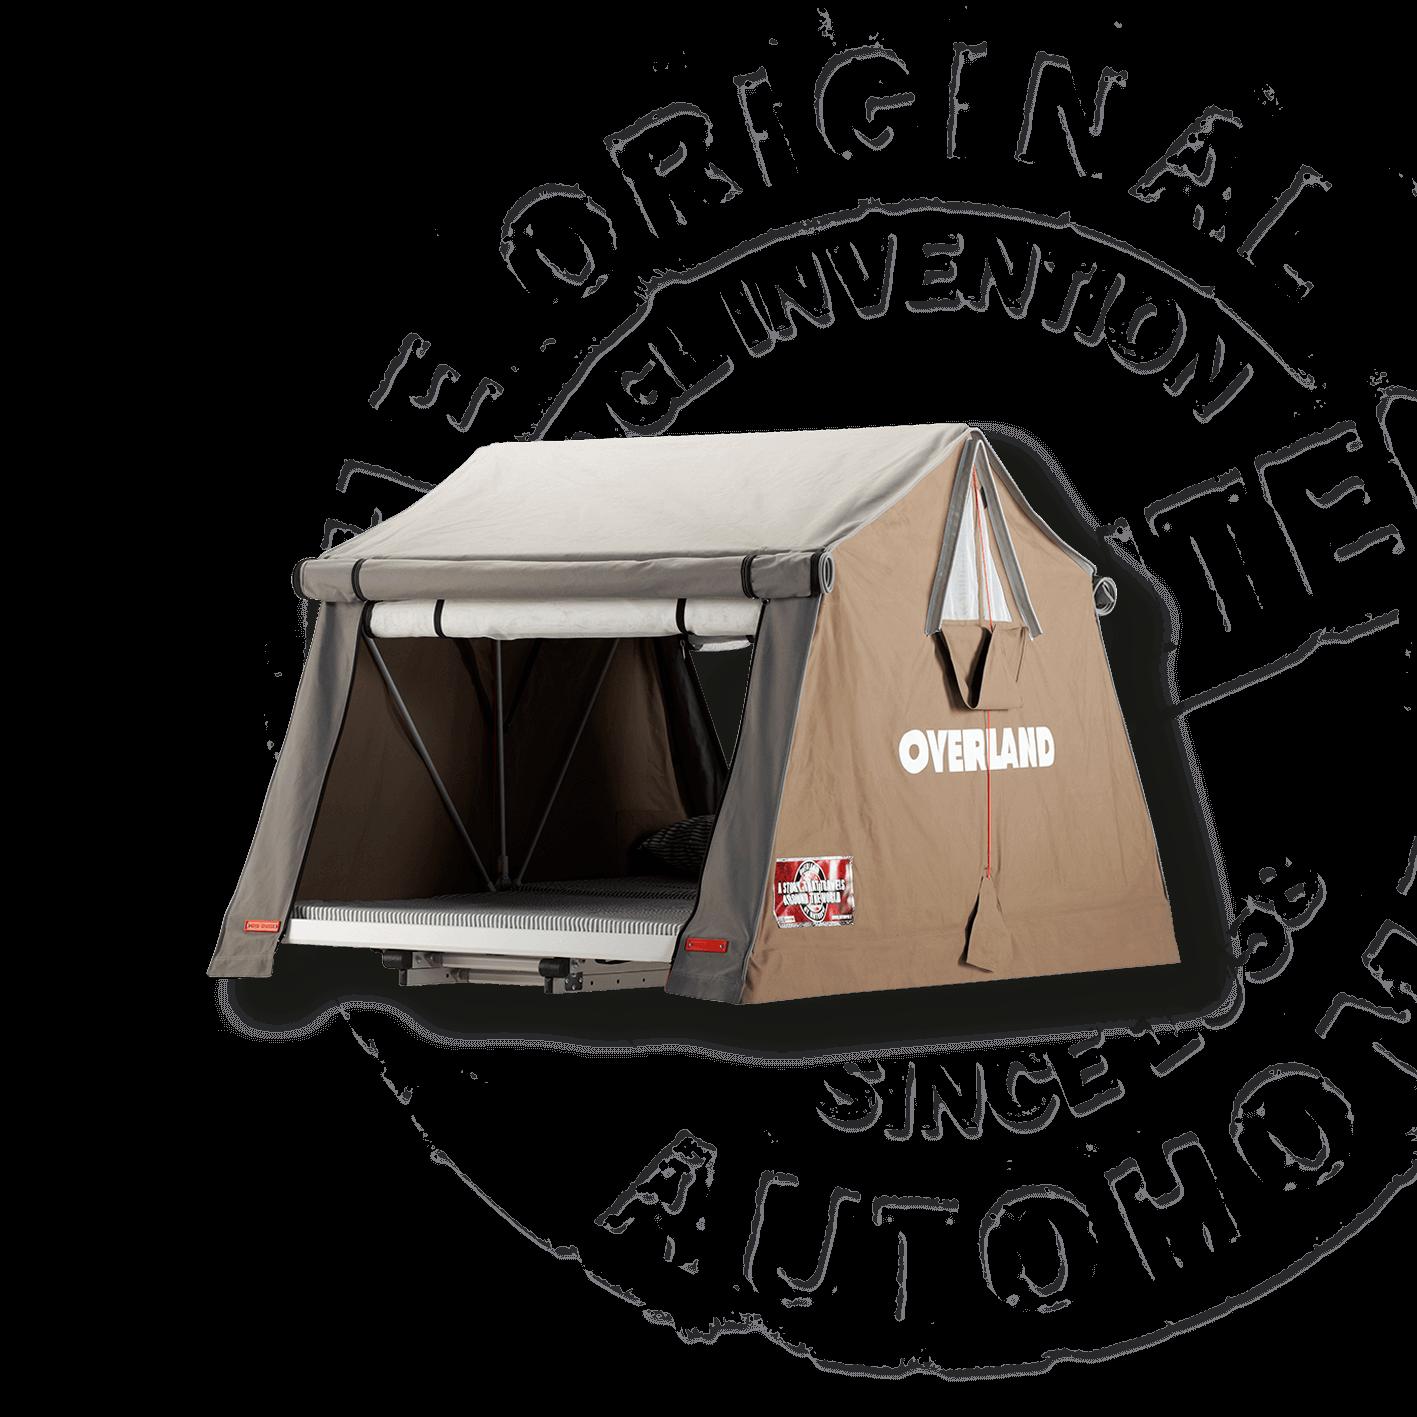 Autohome Dachzelt - Safari Overland Roof Top Tents